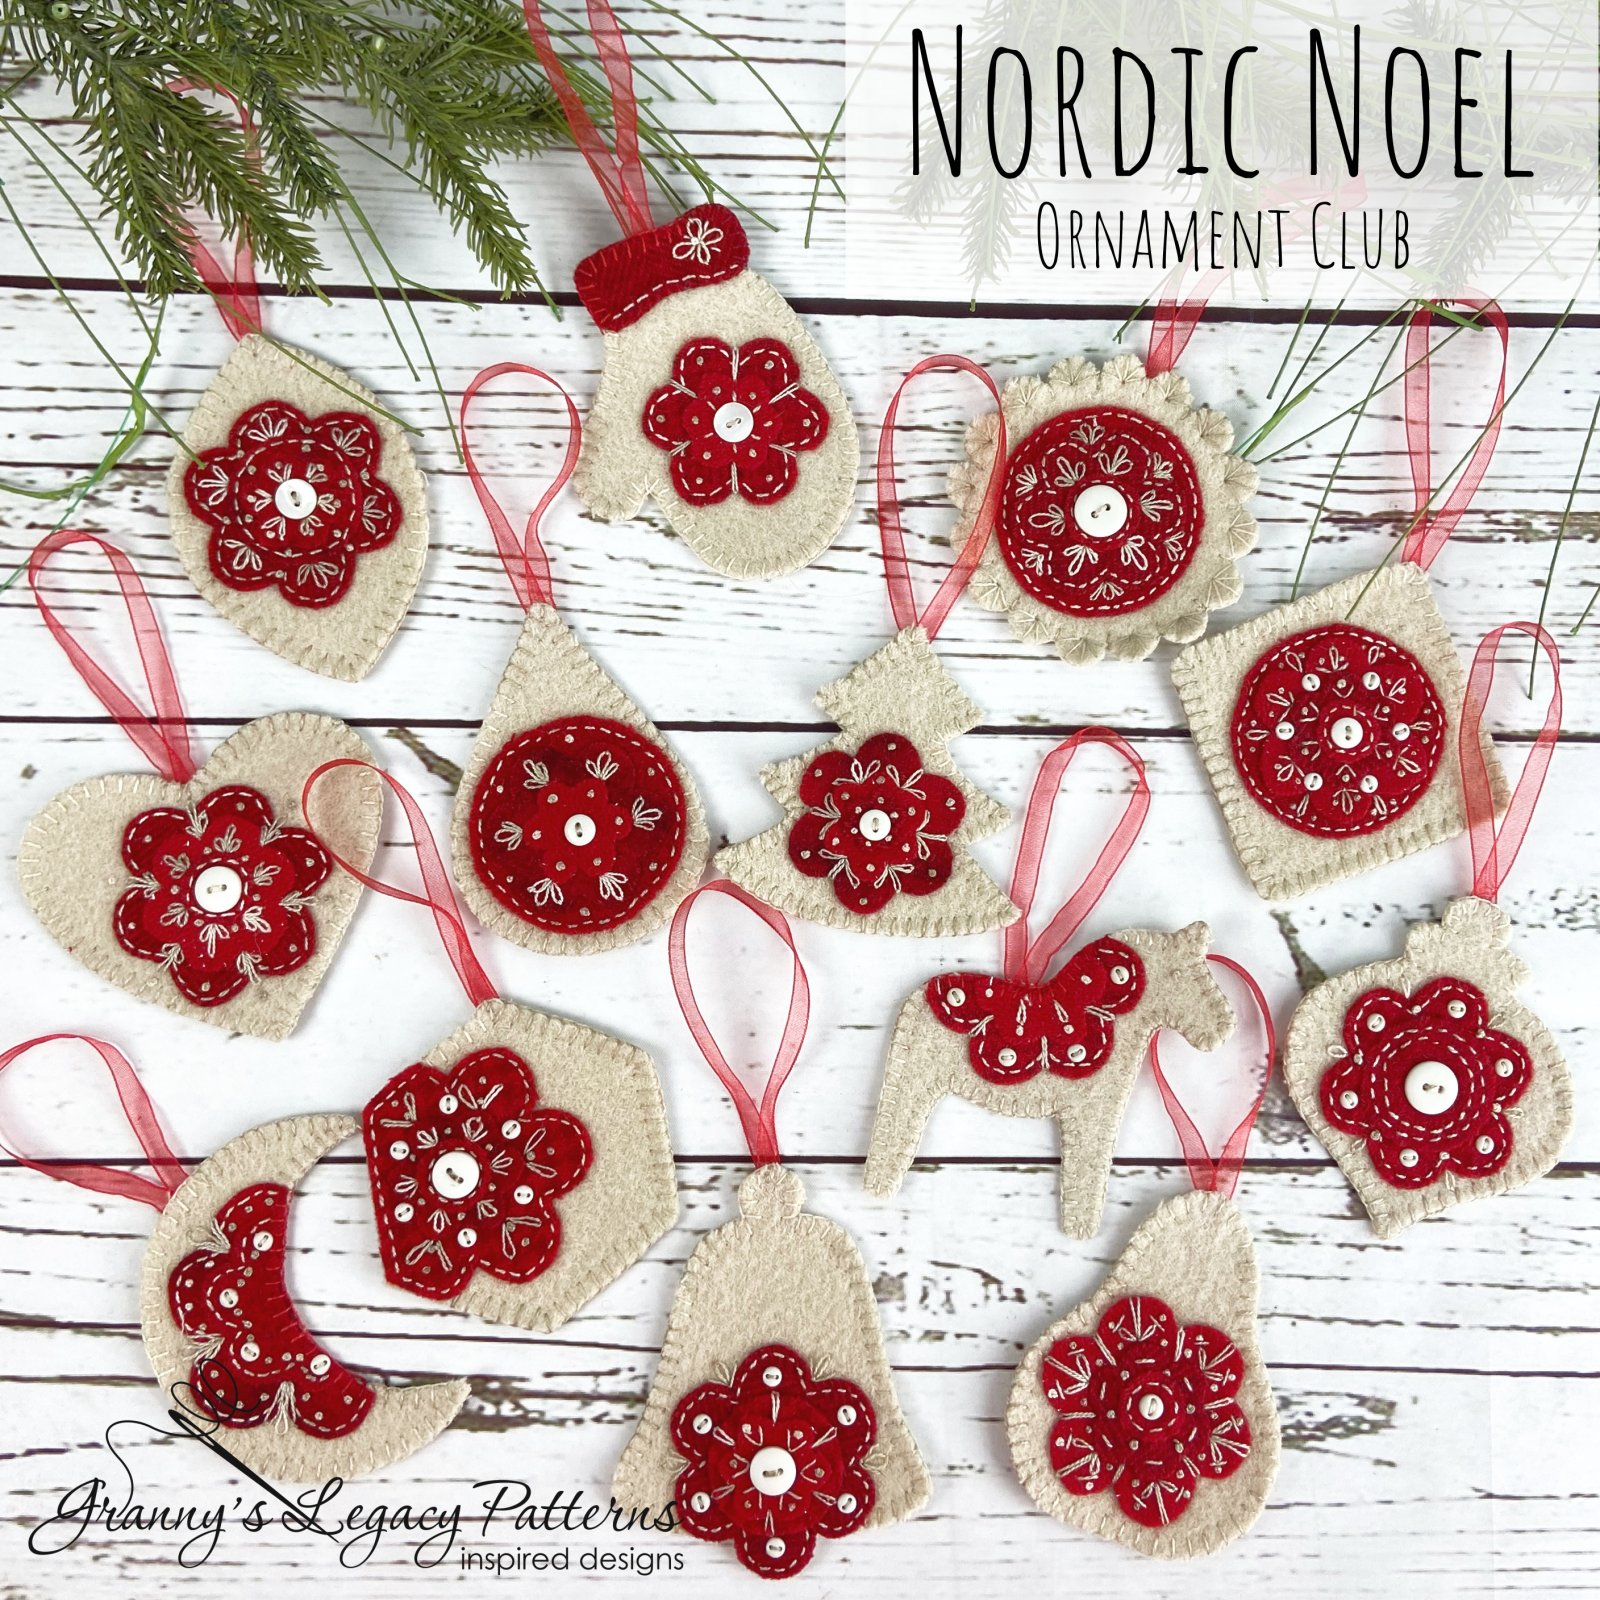 Nordic Noel Ornament Club